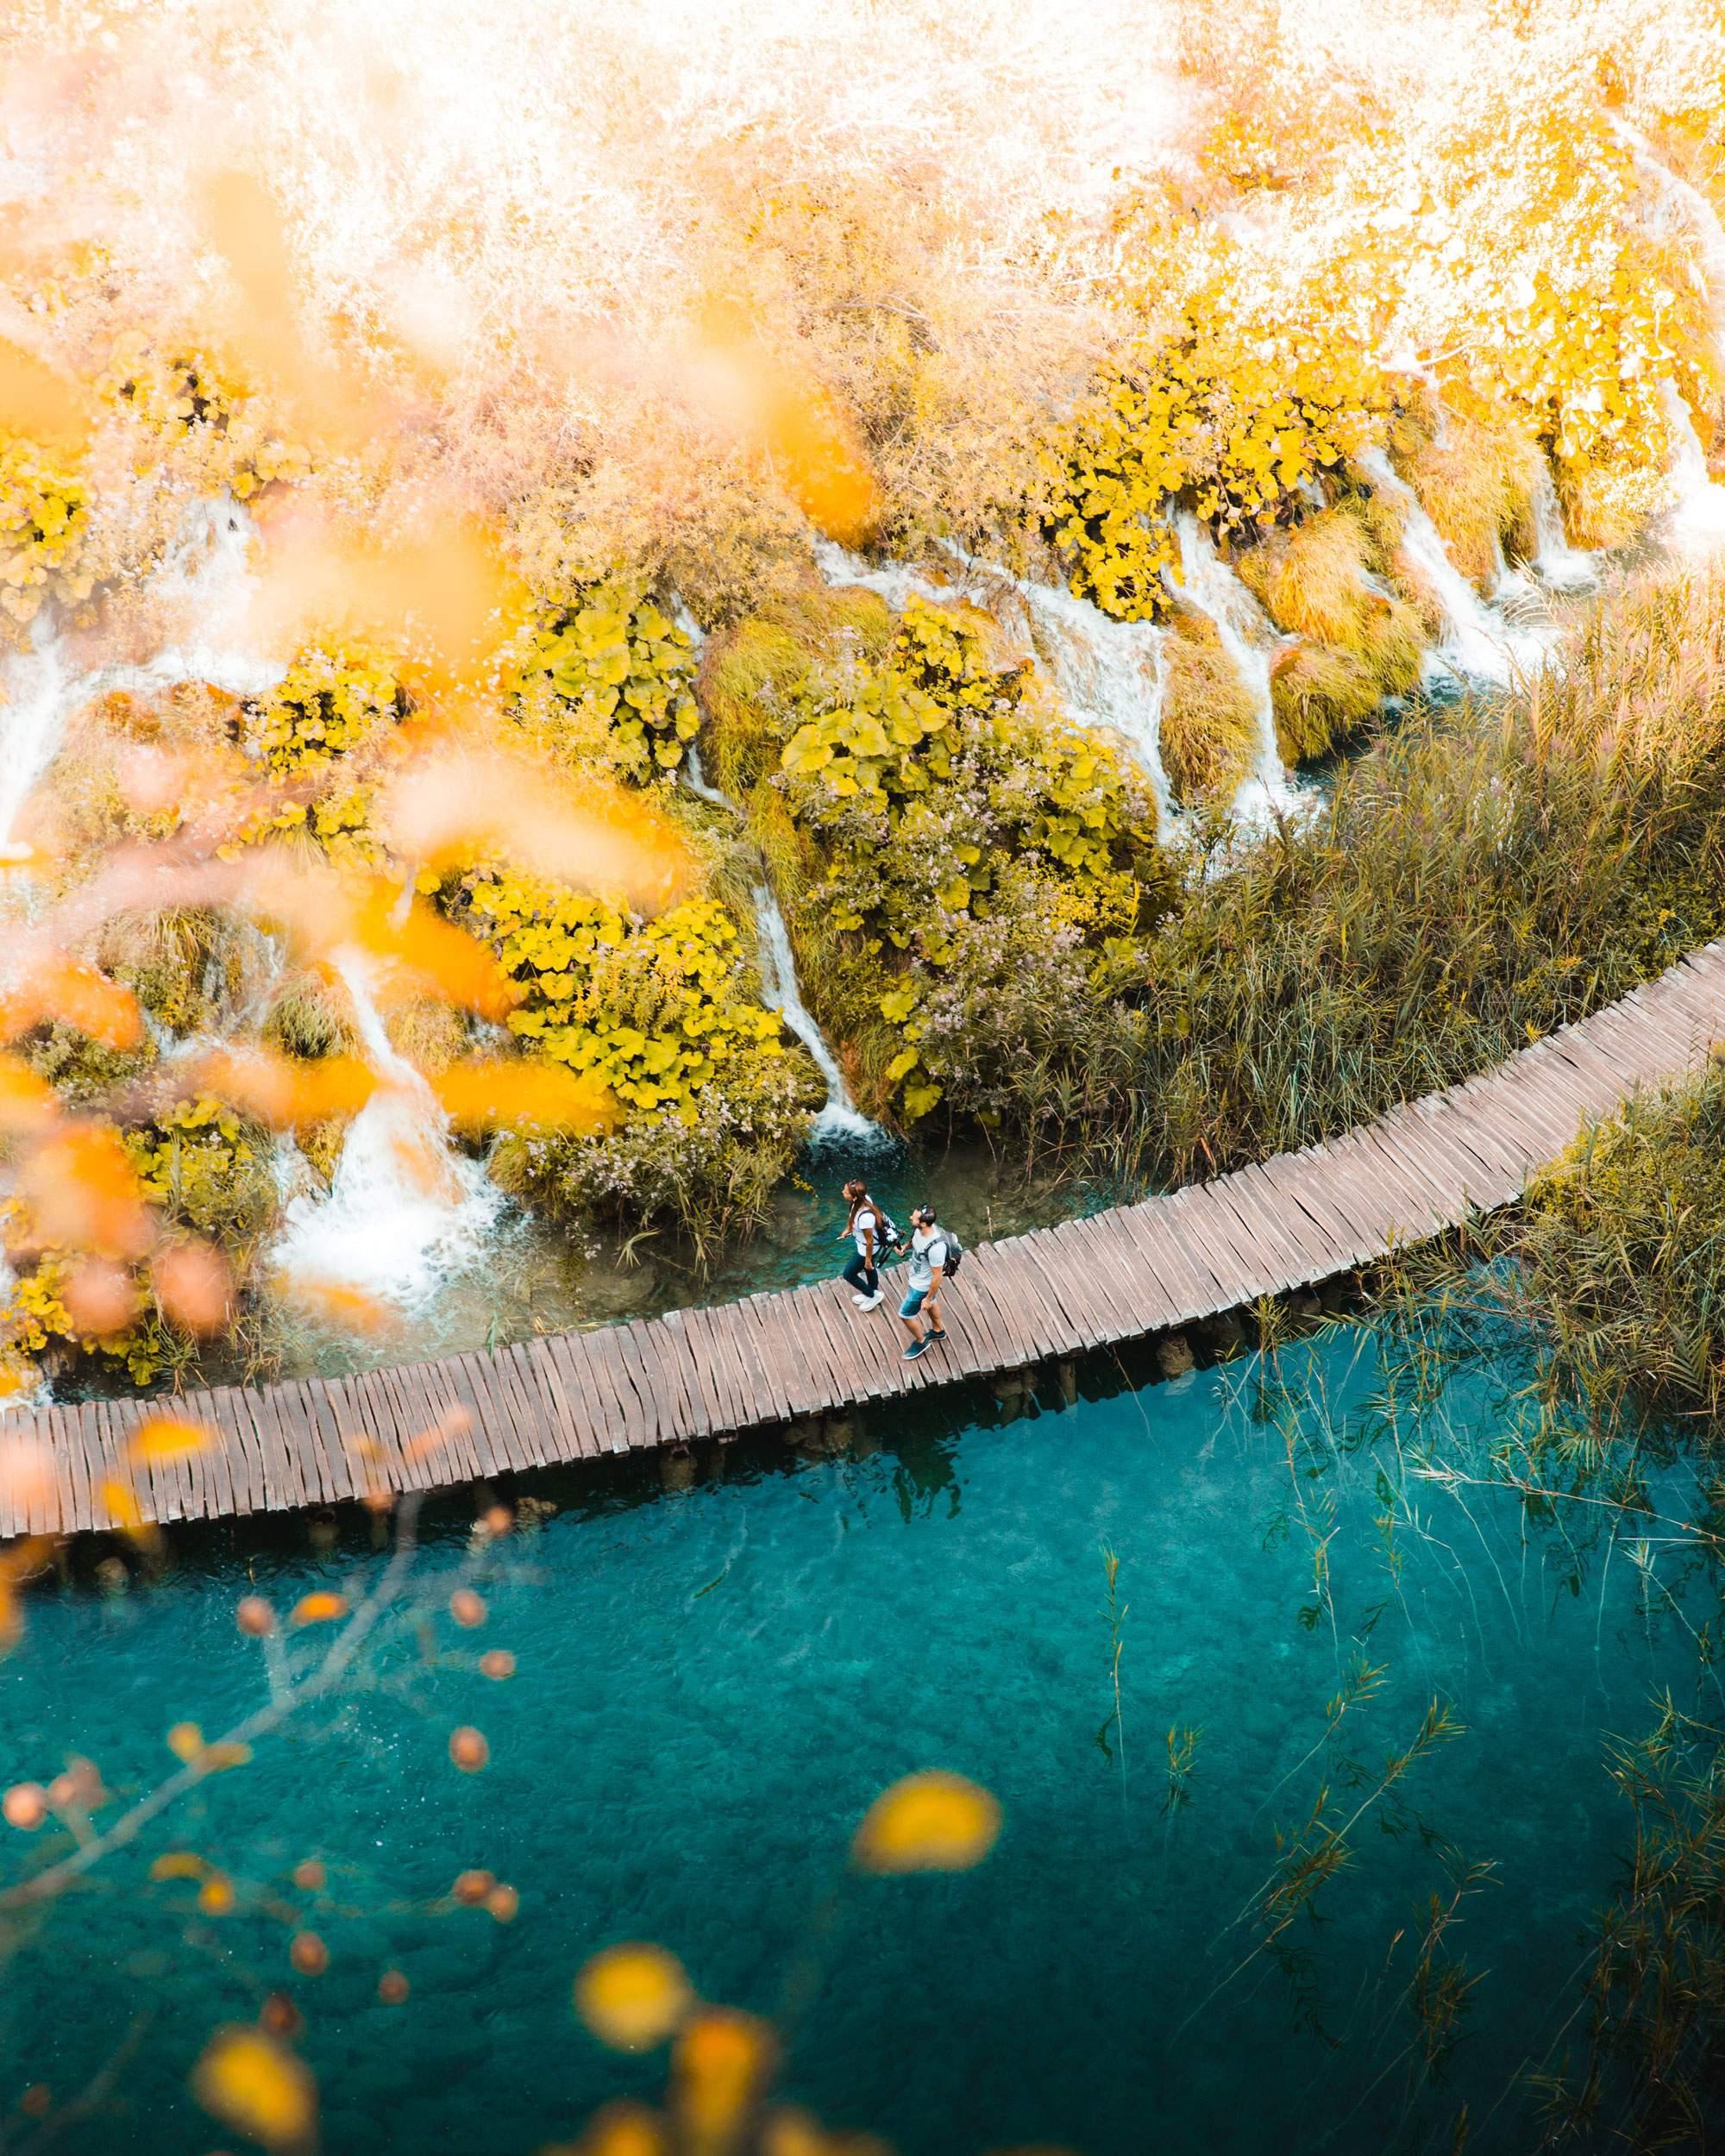 plitvice-national-park-walking-trails-croatia-travel